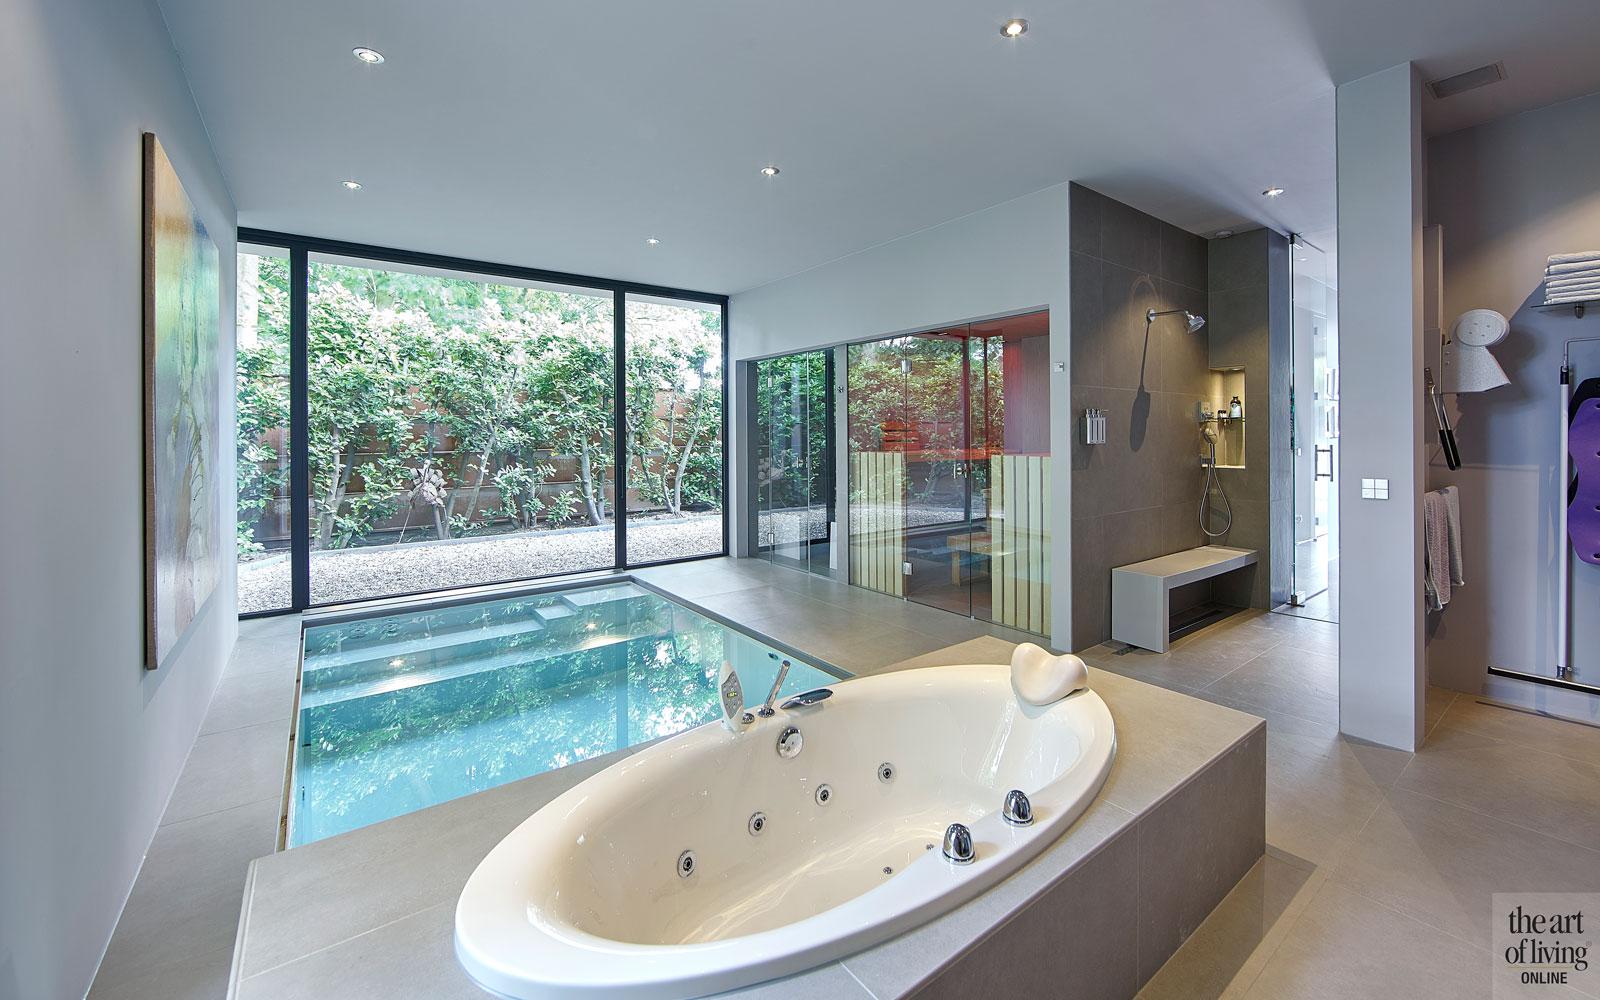 Zwembad, kranen, whirlpool, bad, jacuzzi, Moderne villa, Boley, The Art of Living